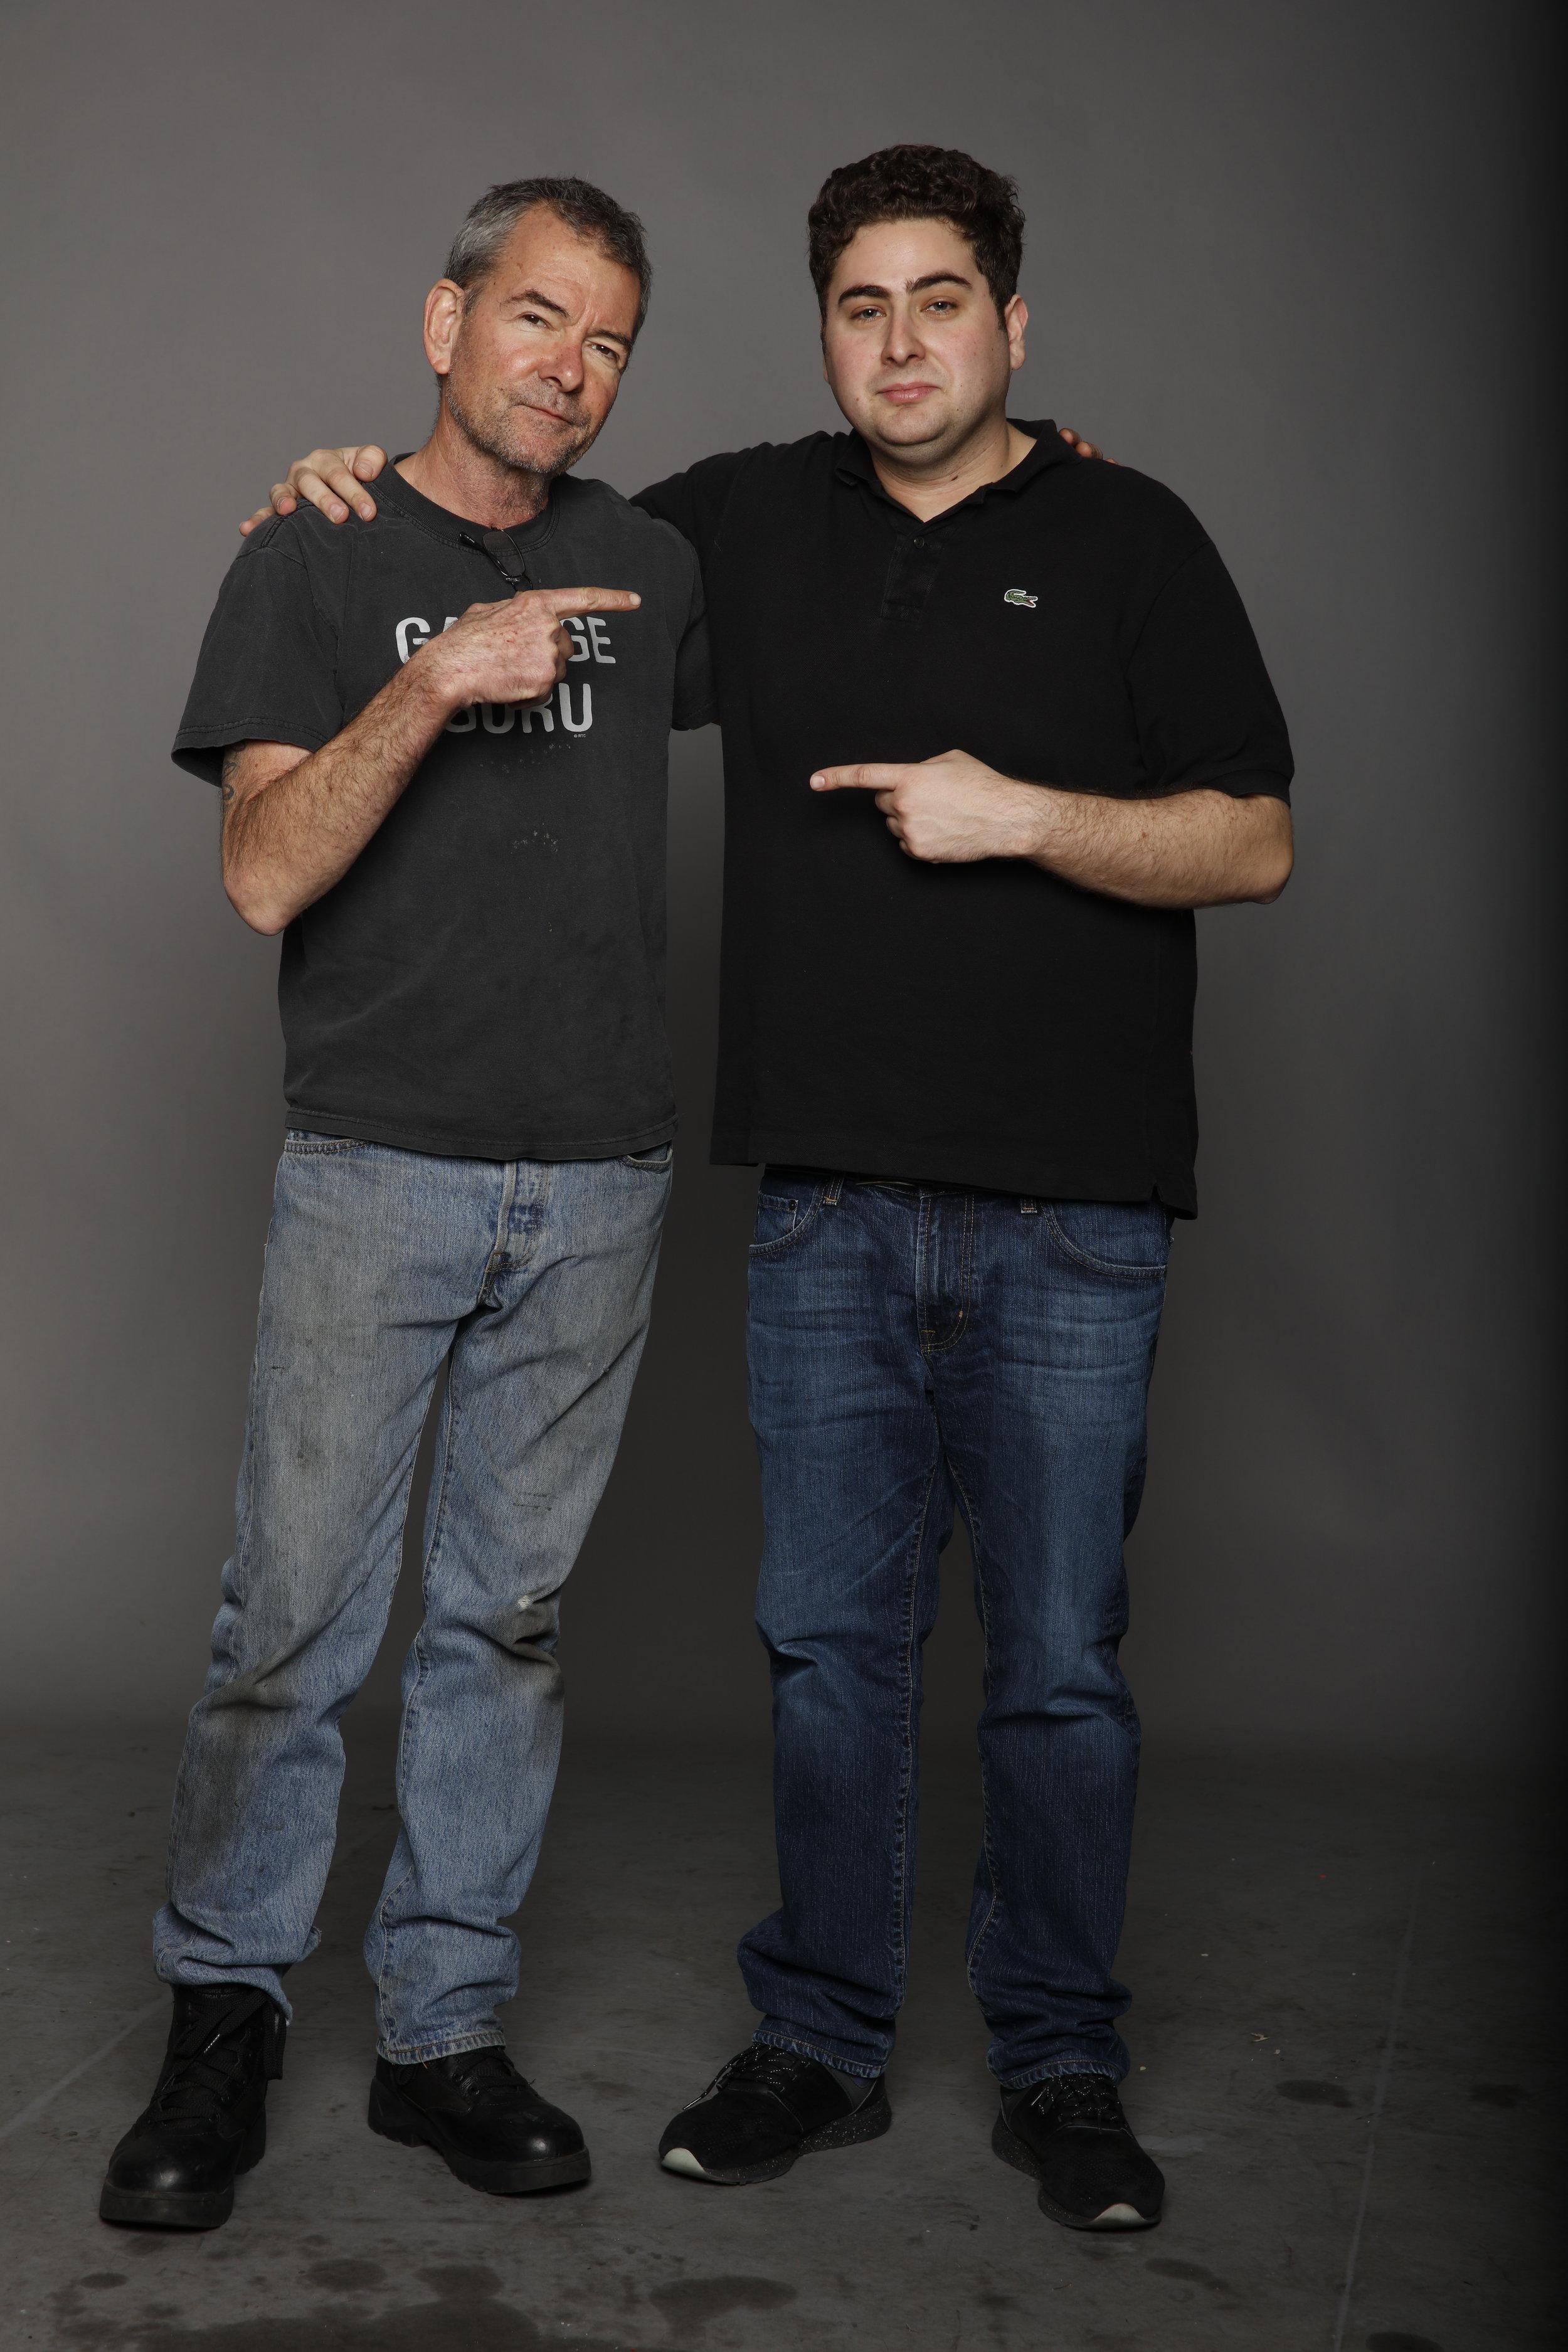 Photo by: Jason Sutter | Left: Neil Zlozower Right: Alex Kluft